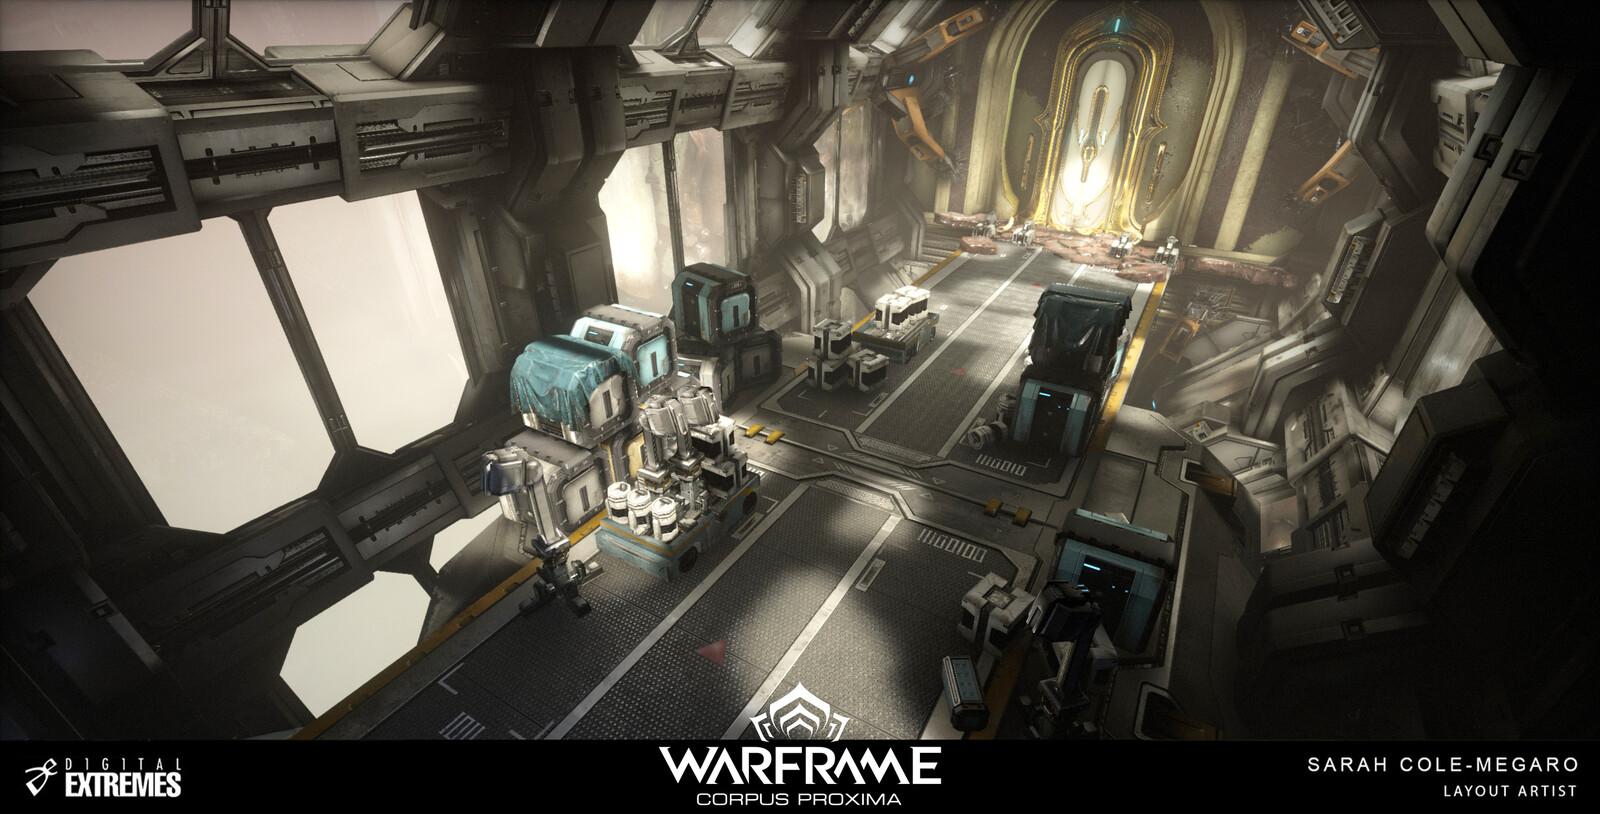 Warframe: Corpus Proxima Update - Derelict Orokin Shield Node